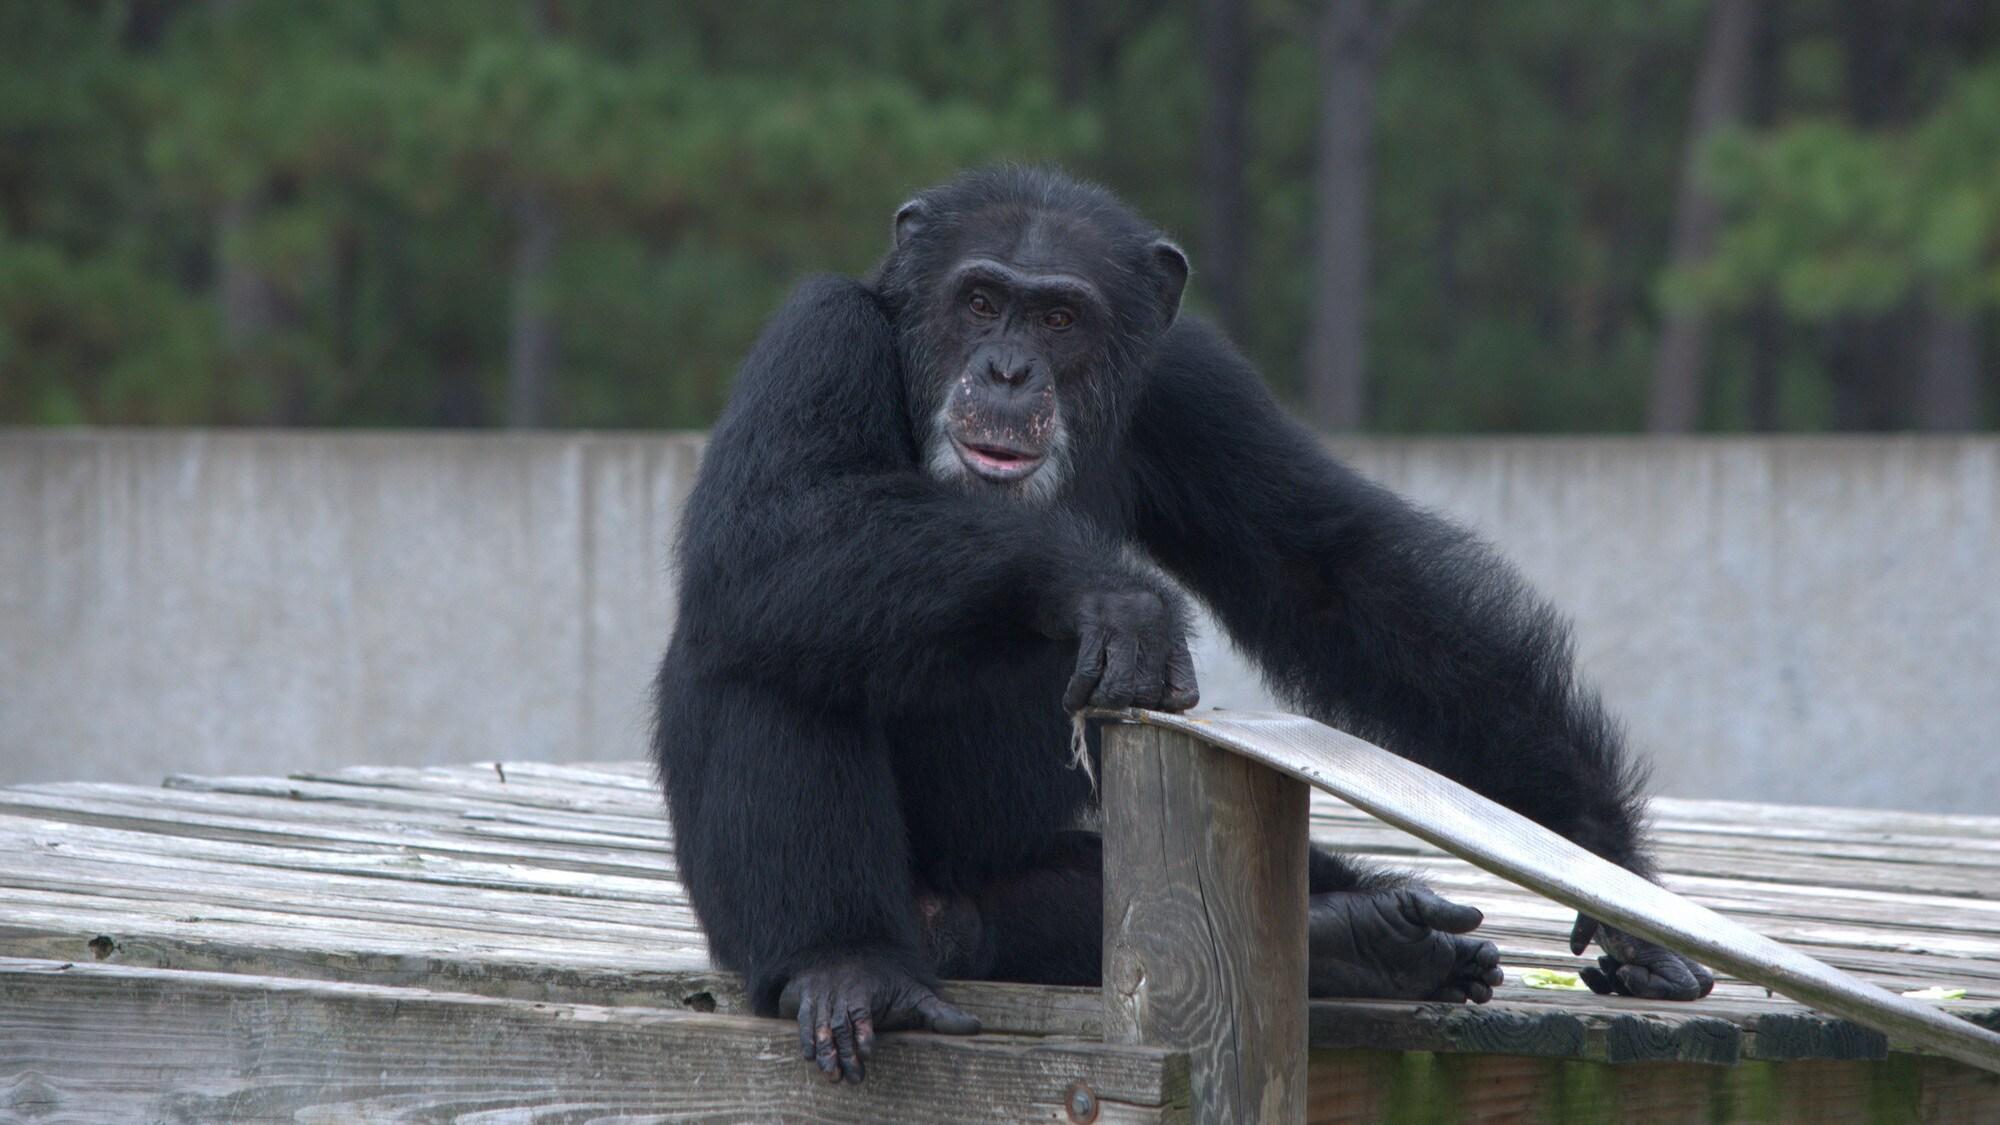 Henry sat on platform looking into distance. Donovan's group. (Chimp Haven)